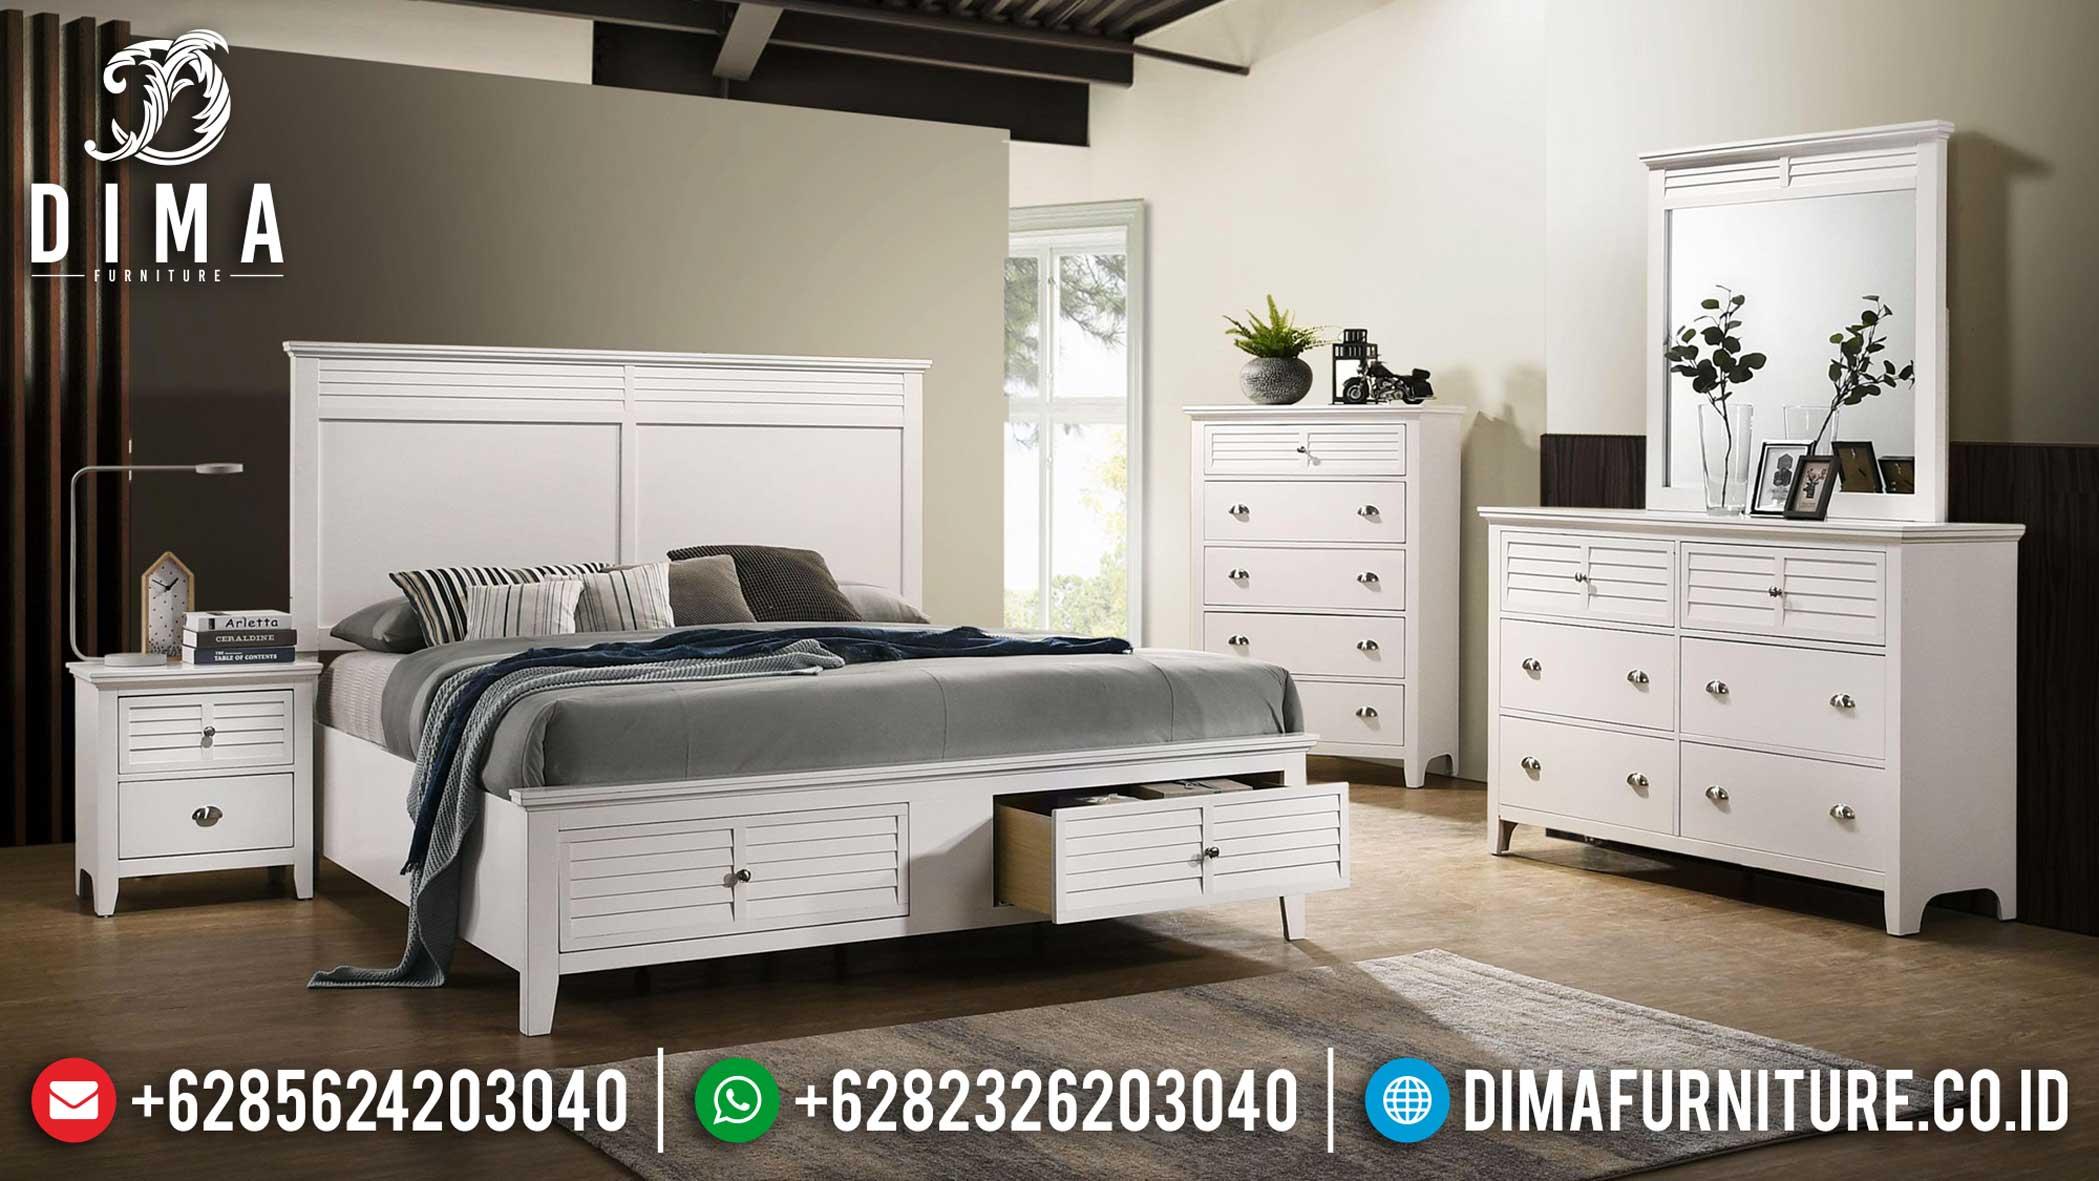 New Set Tempat Tidur Modern Minimalis Putih Duco Pricebreak Sesion TTJ-1102